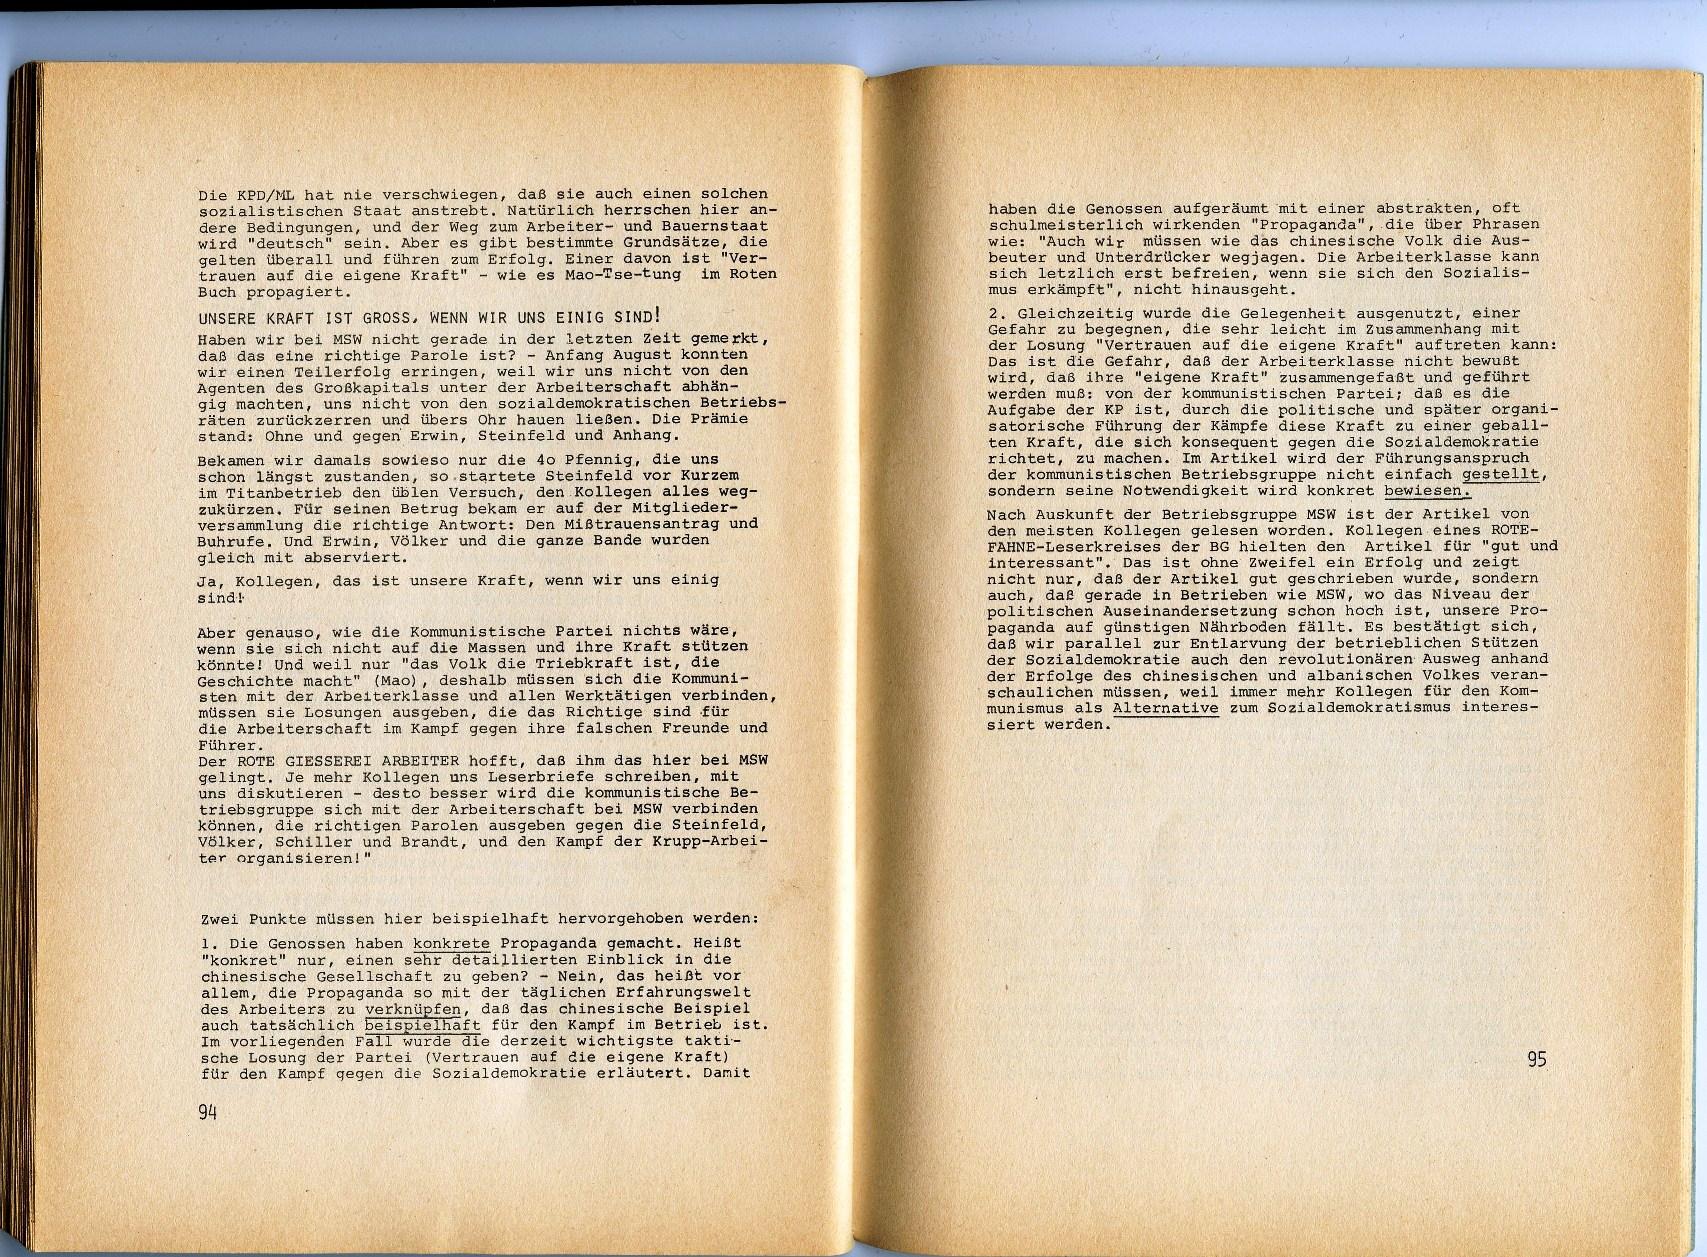 ZB_Parteiarbeiter_1971_08_49